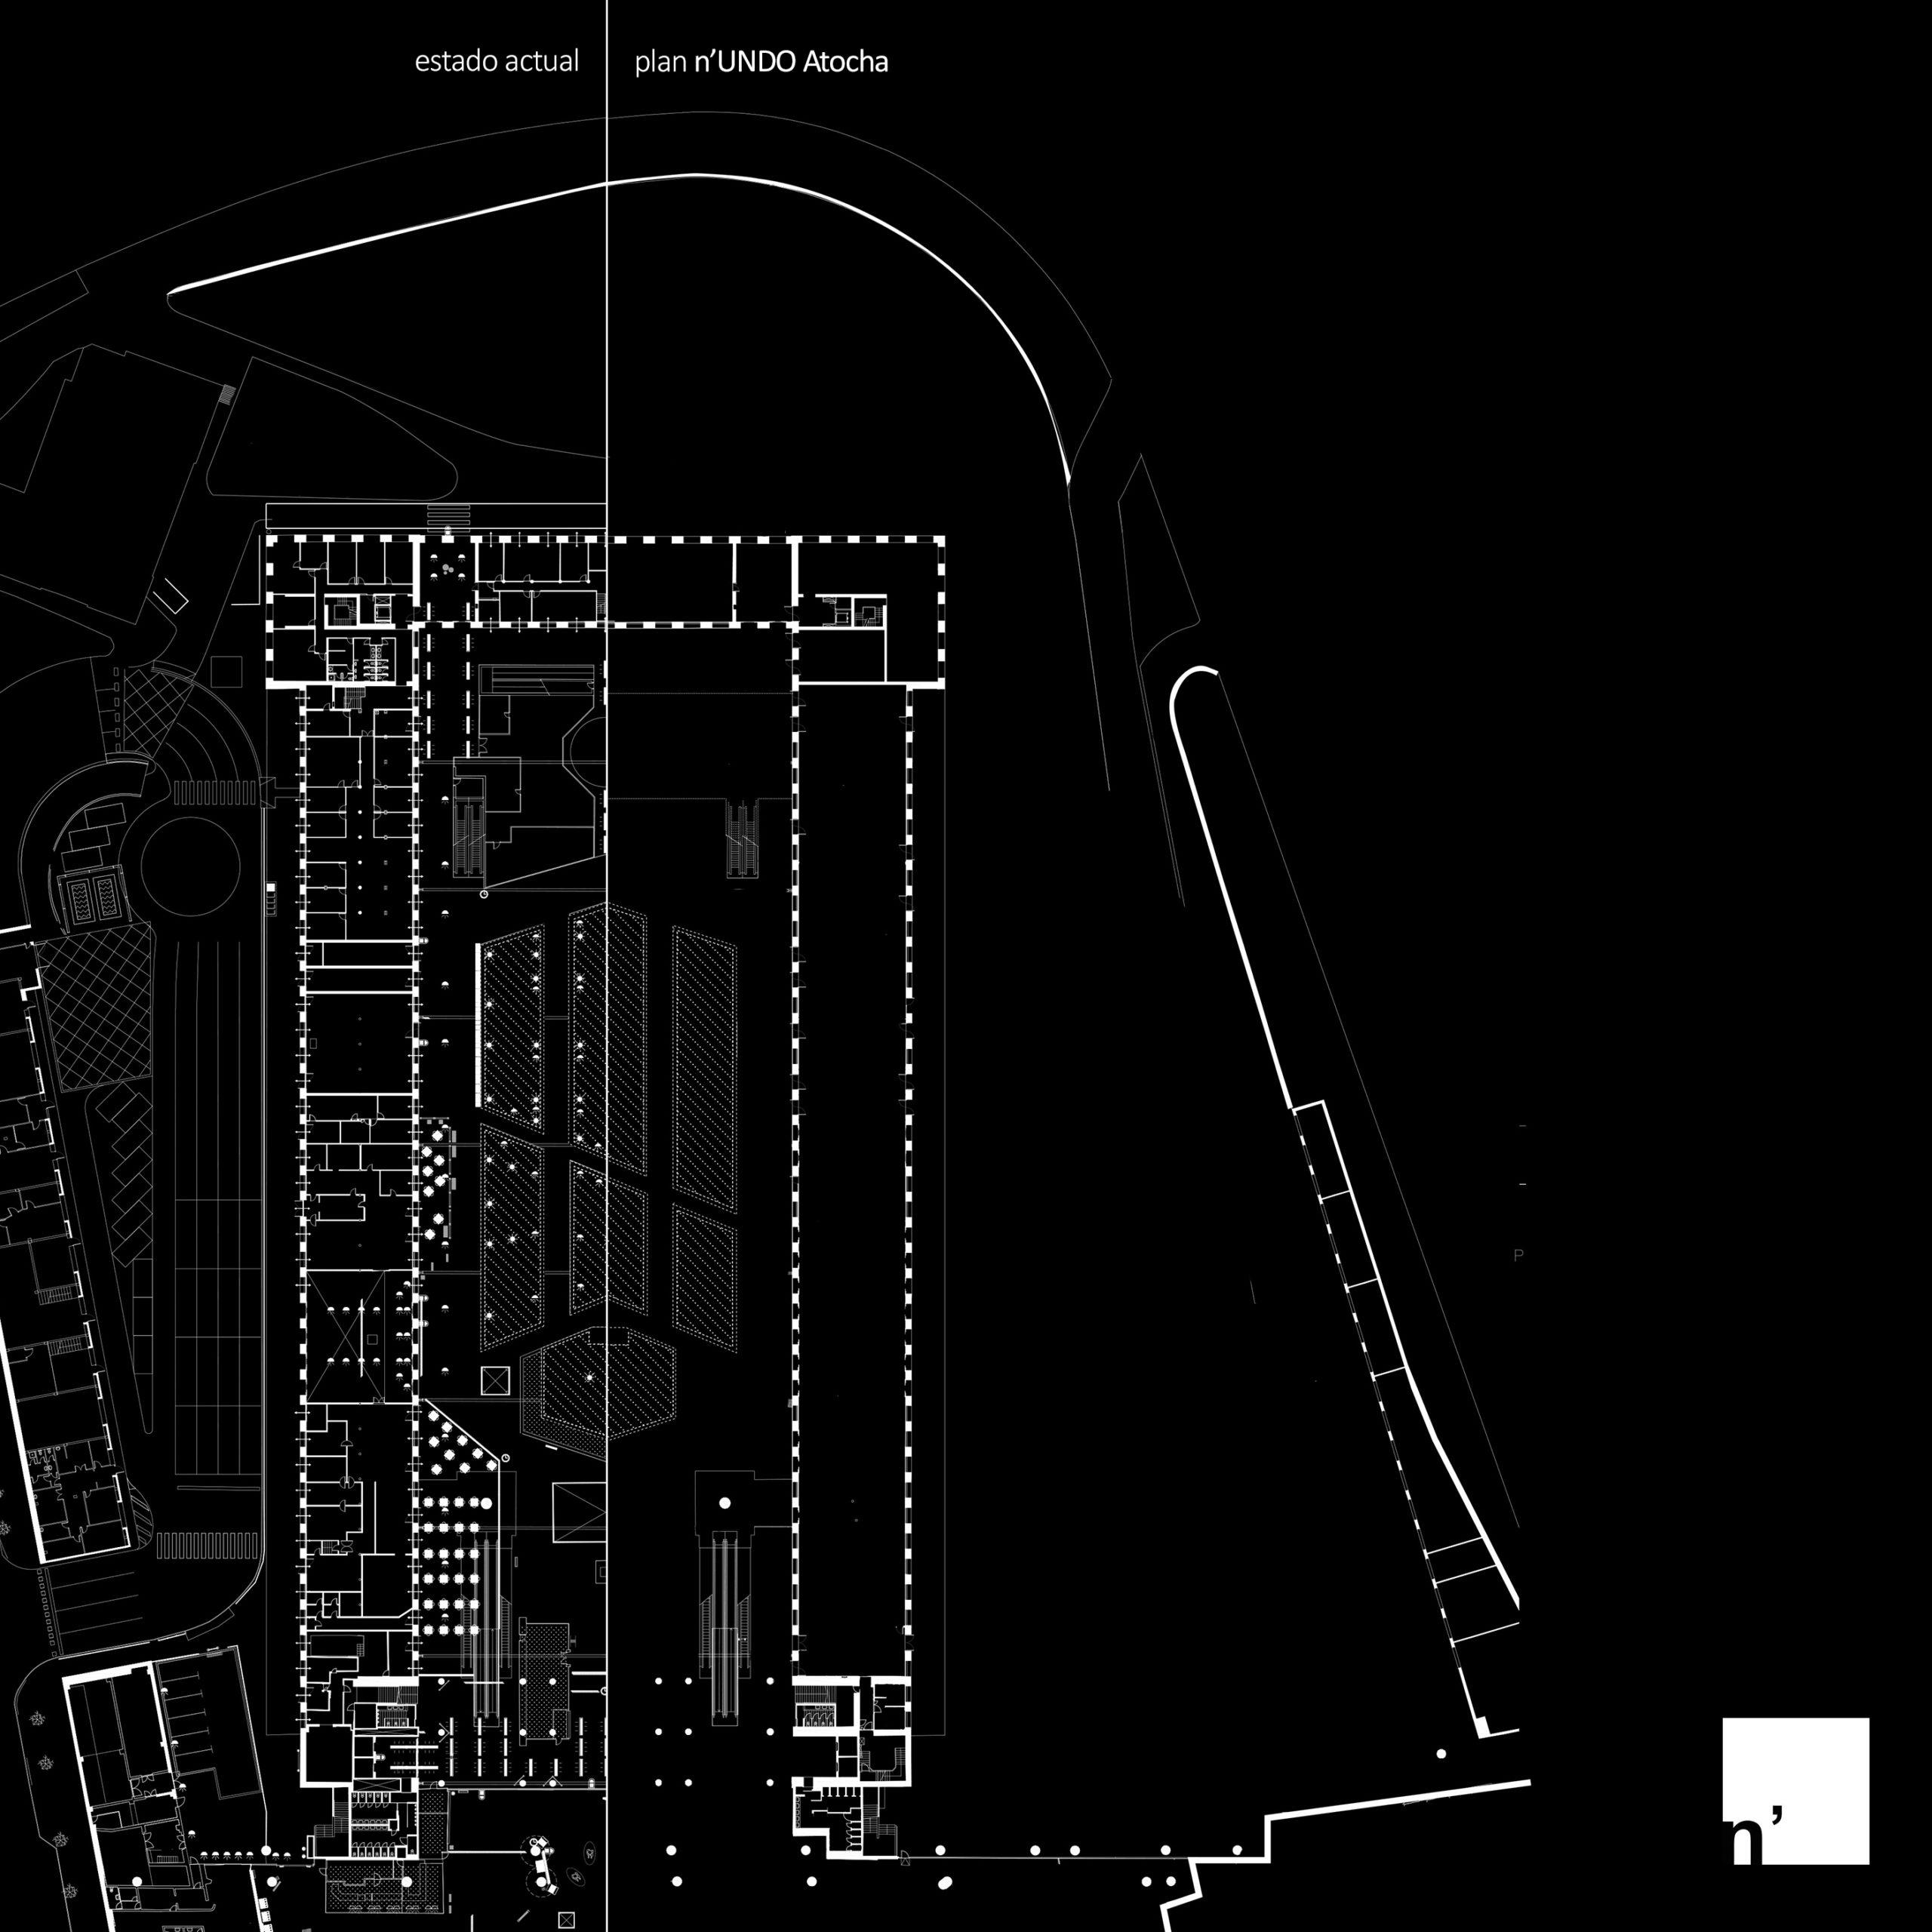 01_plan Atocha_ Imagen principal